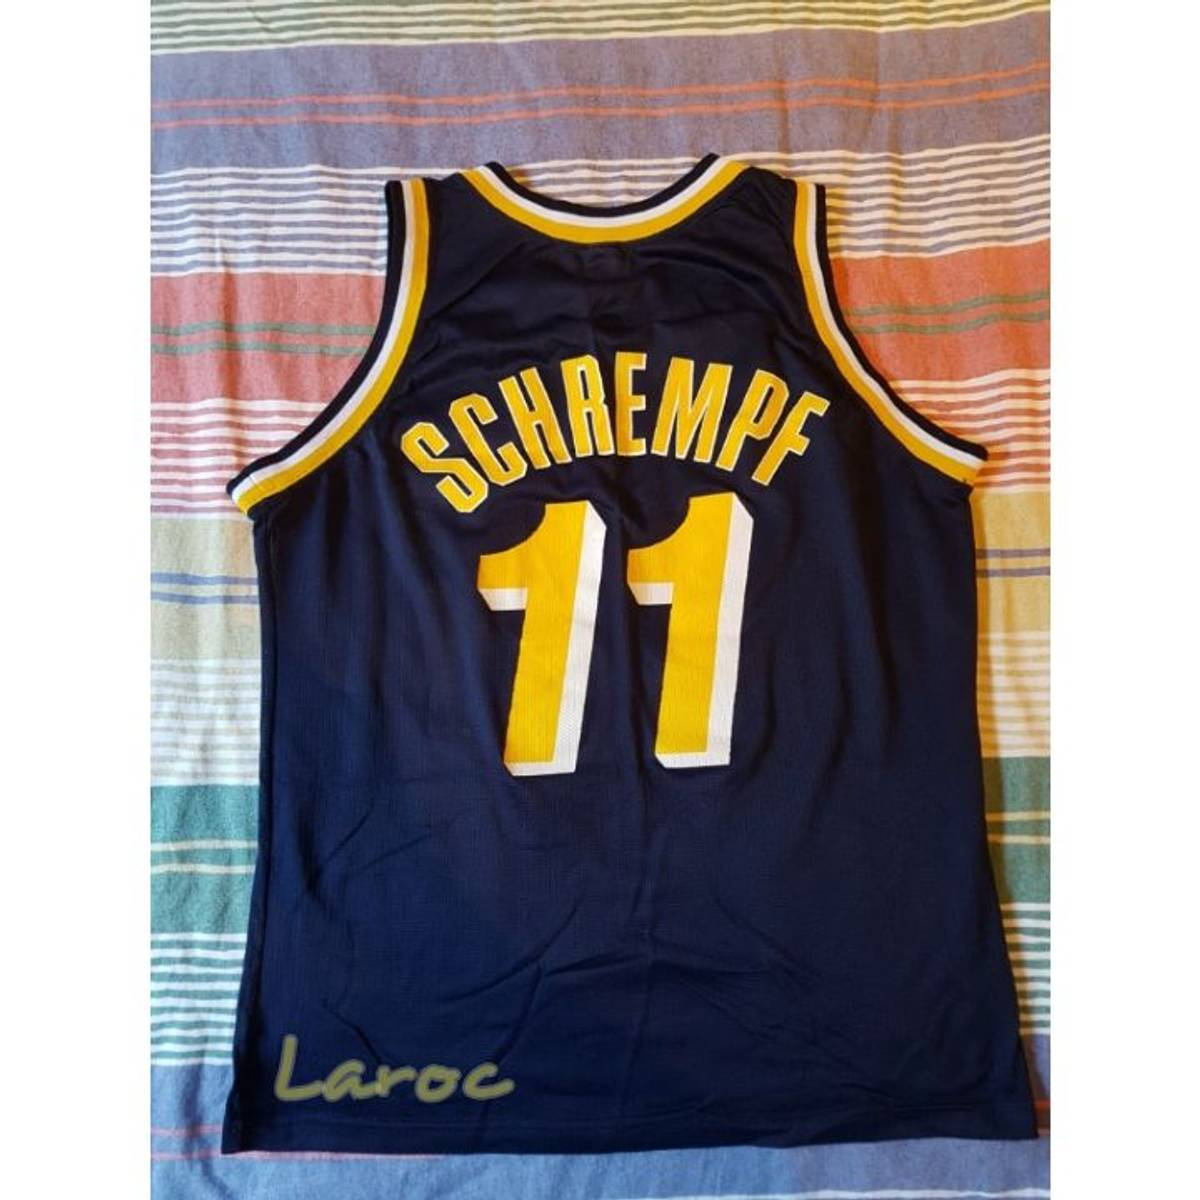 NBA CHAMPION Detlef Schrempf Road Jersey 1991 1992 Indiana